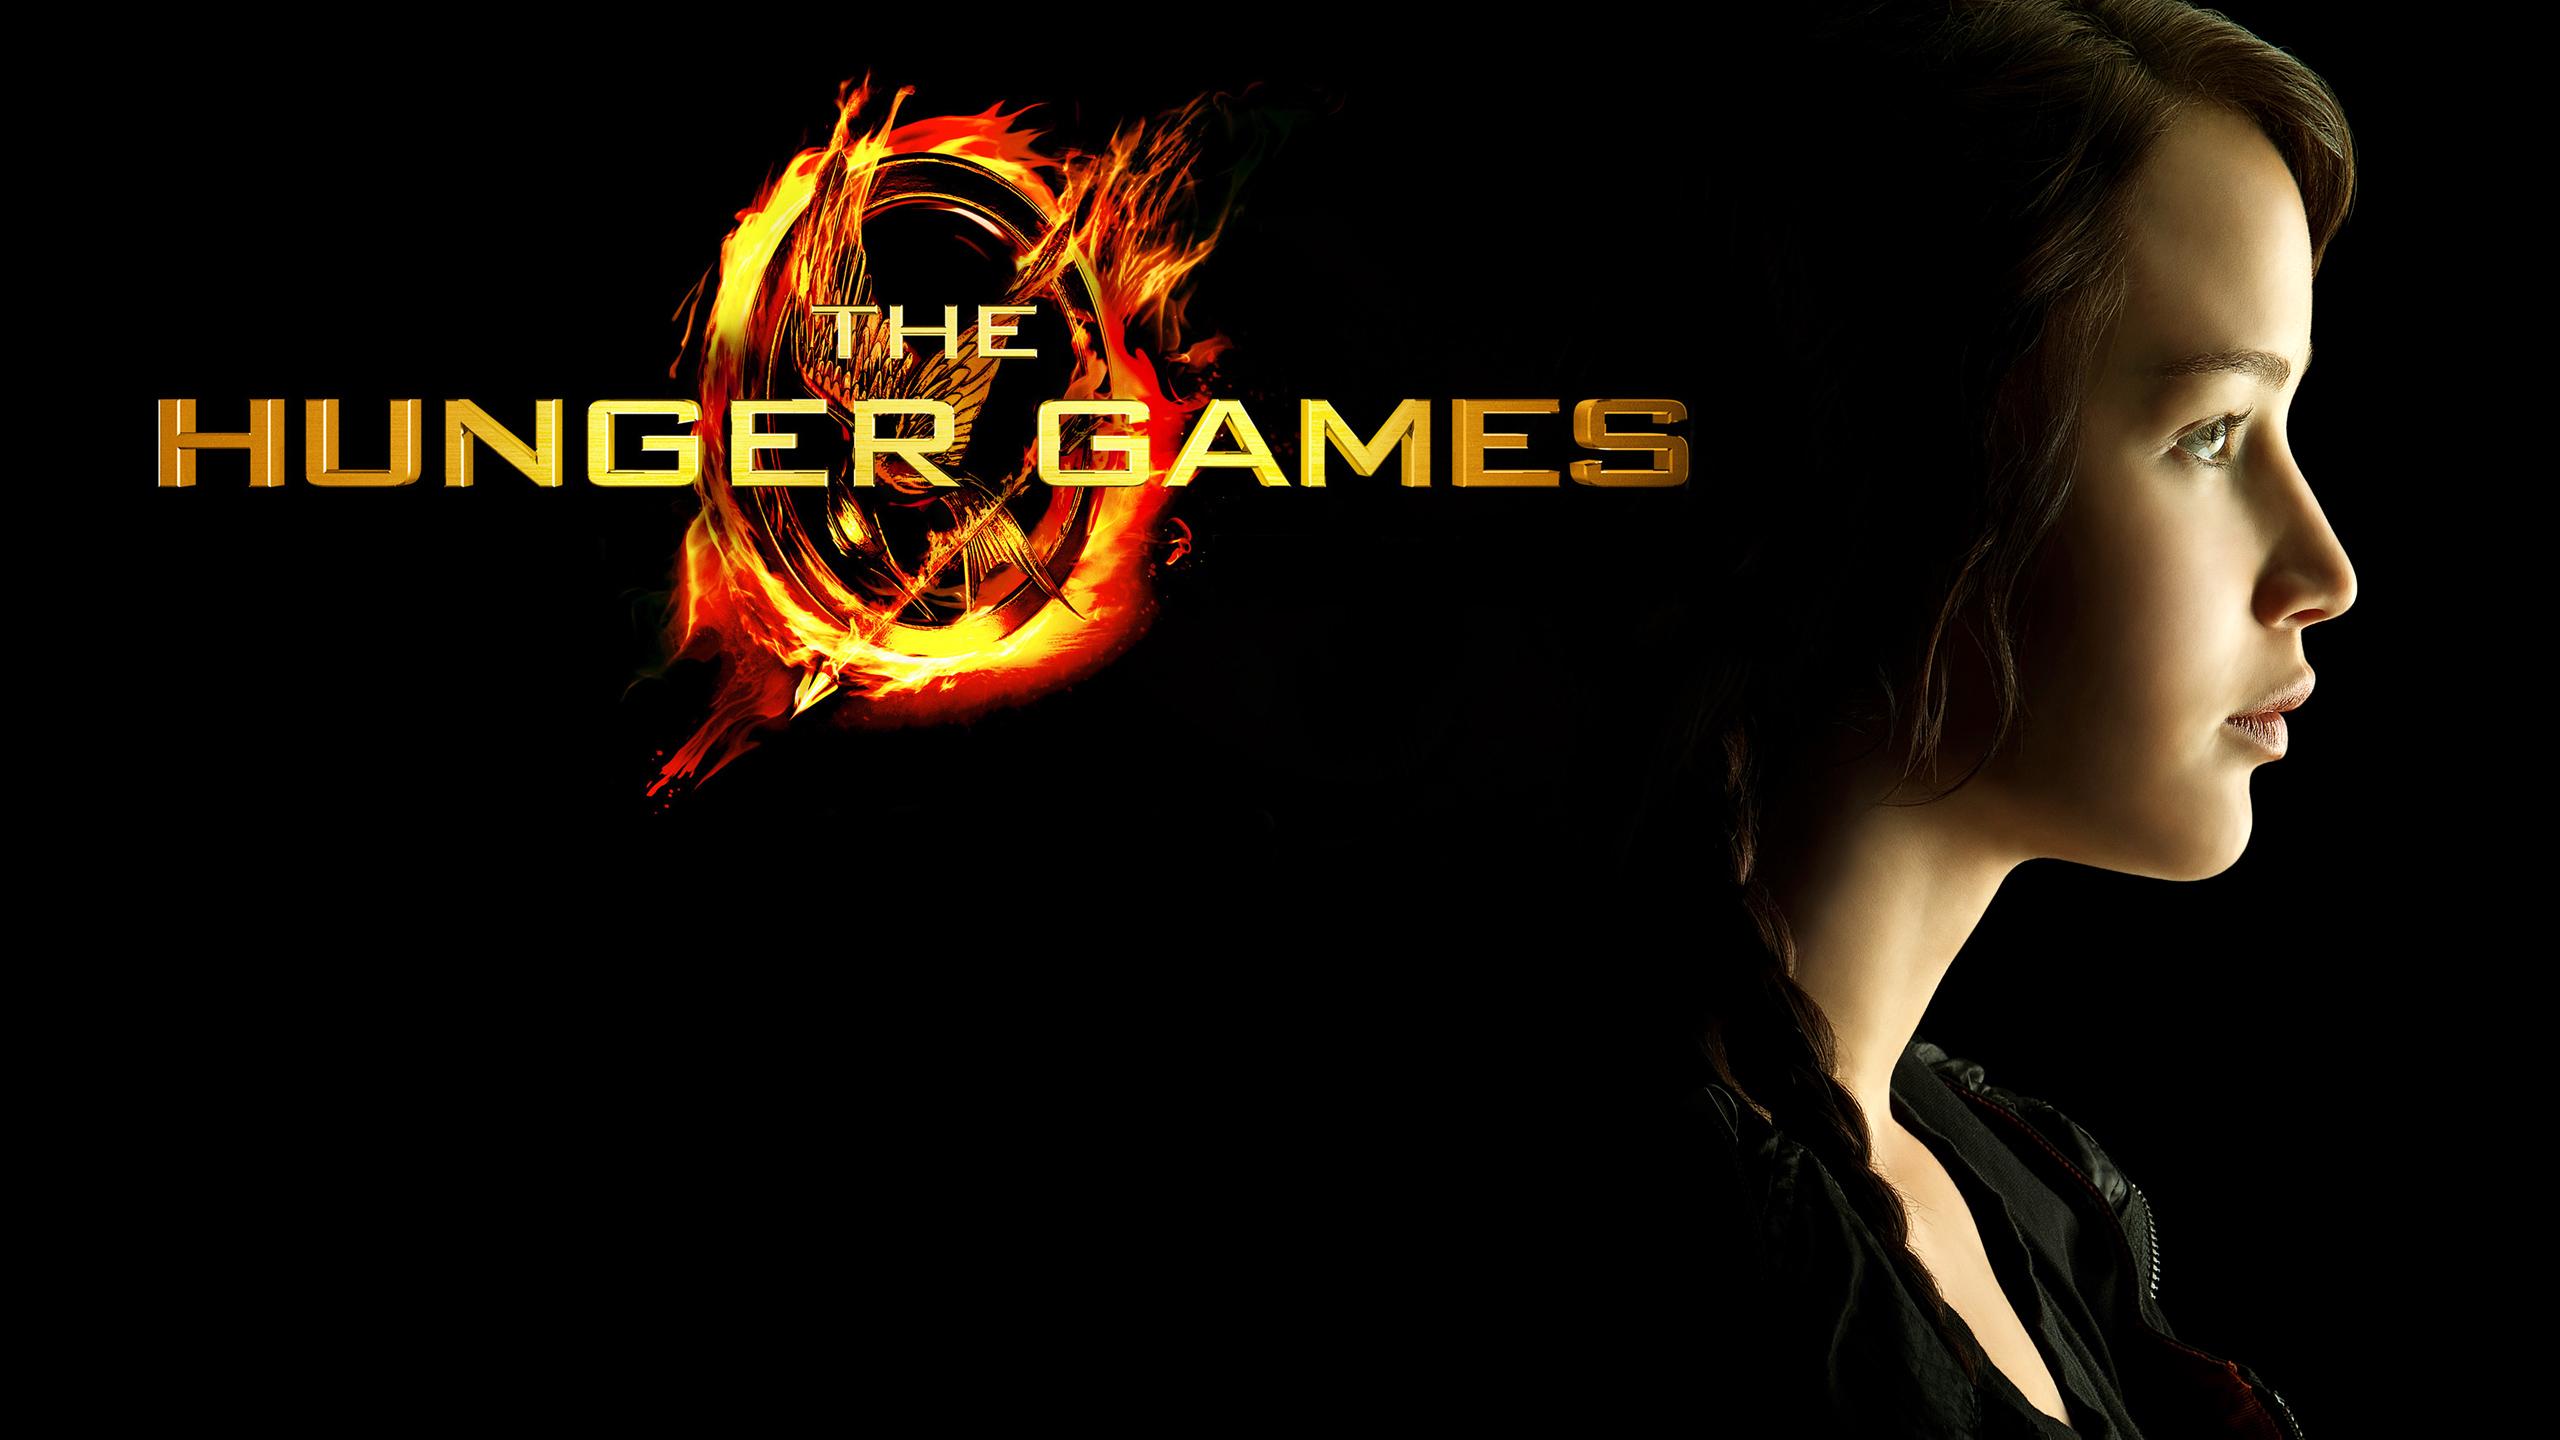 Jennifer Lawrence Hunger Games HD Wallpaper 2815 2560x1440